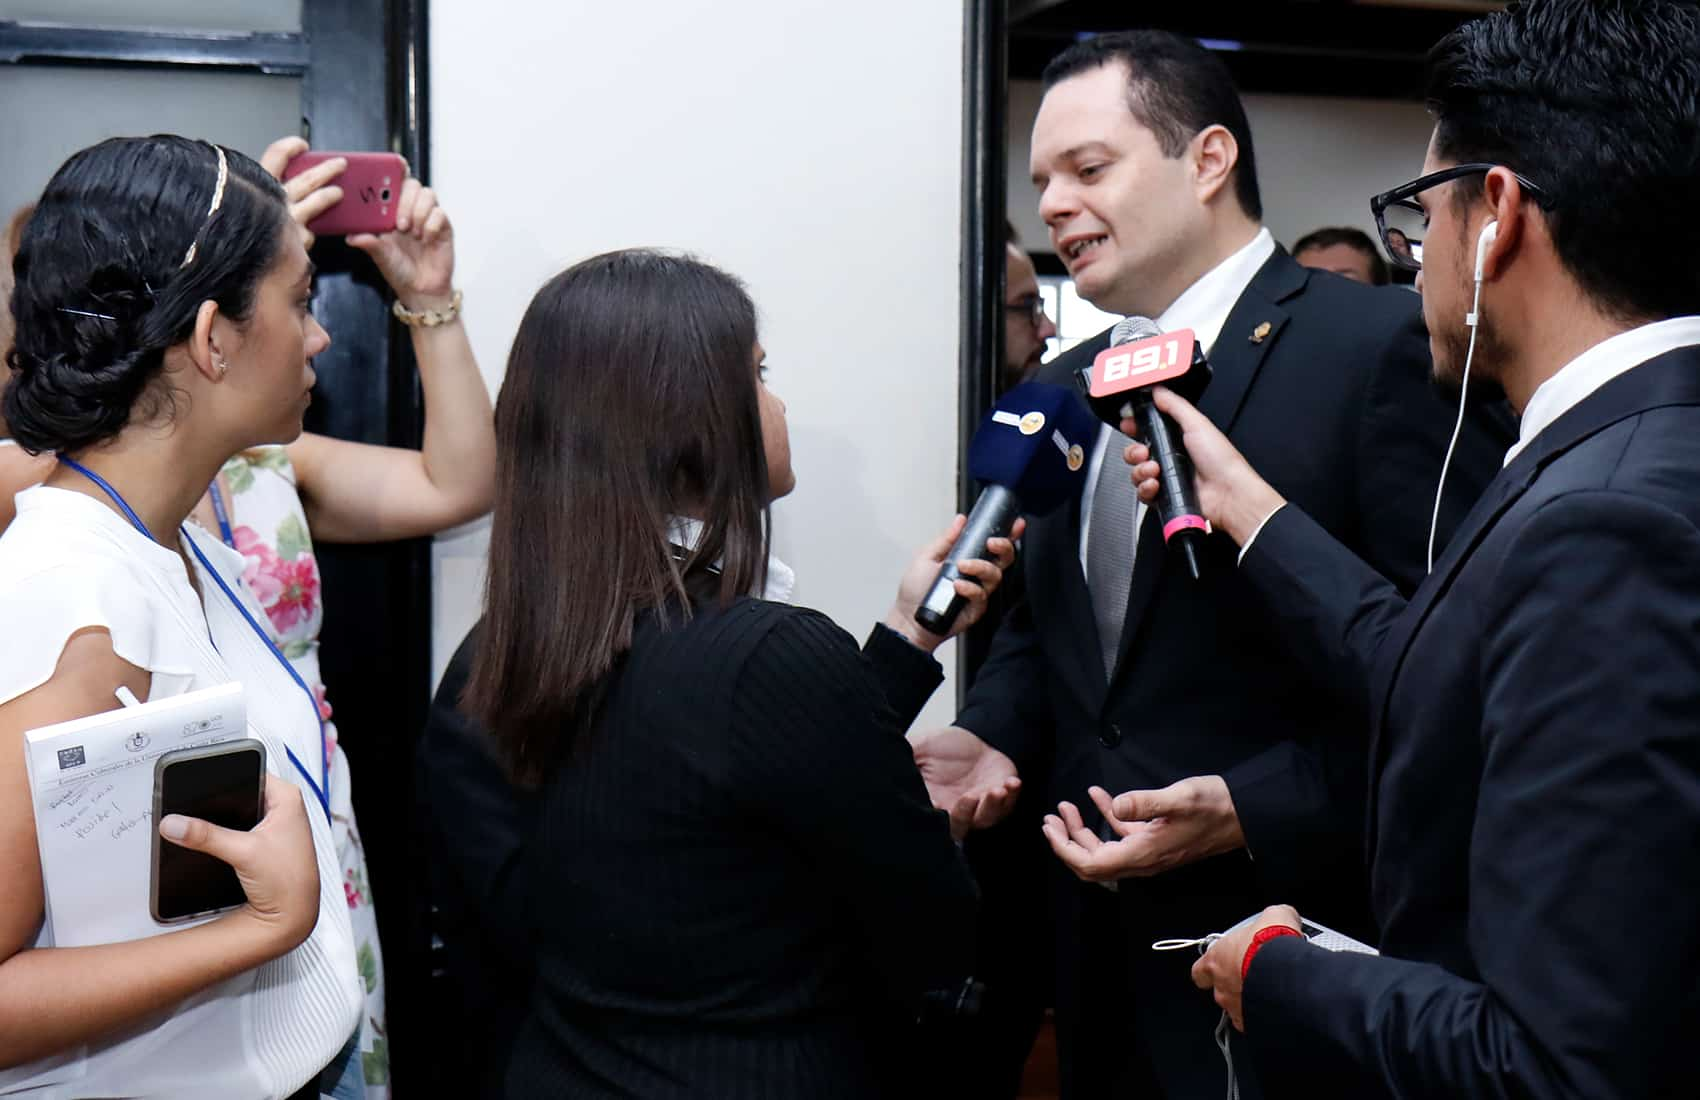 Gonzalo Ramírez Zamora, lawmaker Costa Rican Renovation Party. May 1, 2017.